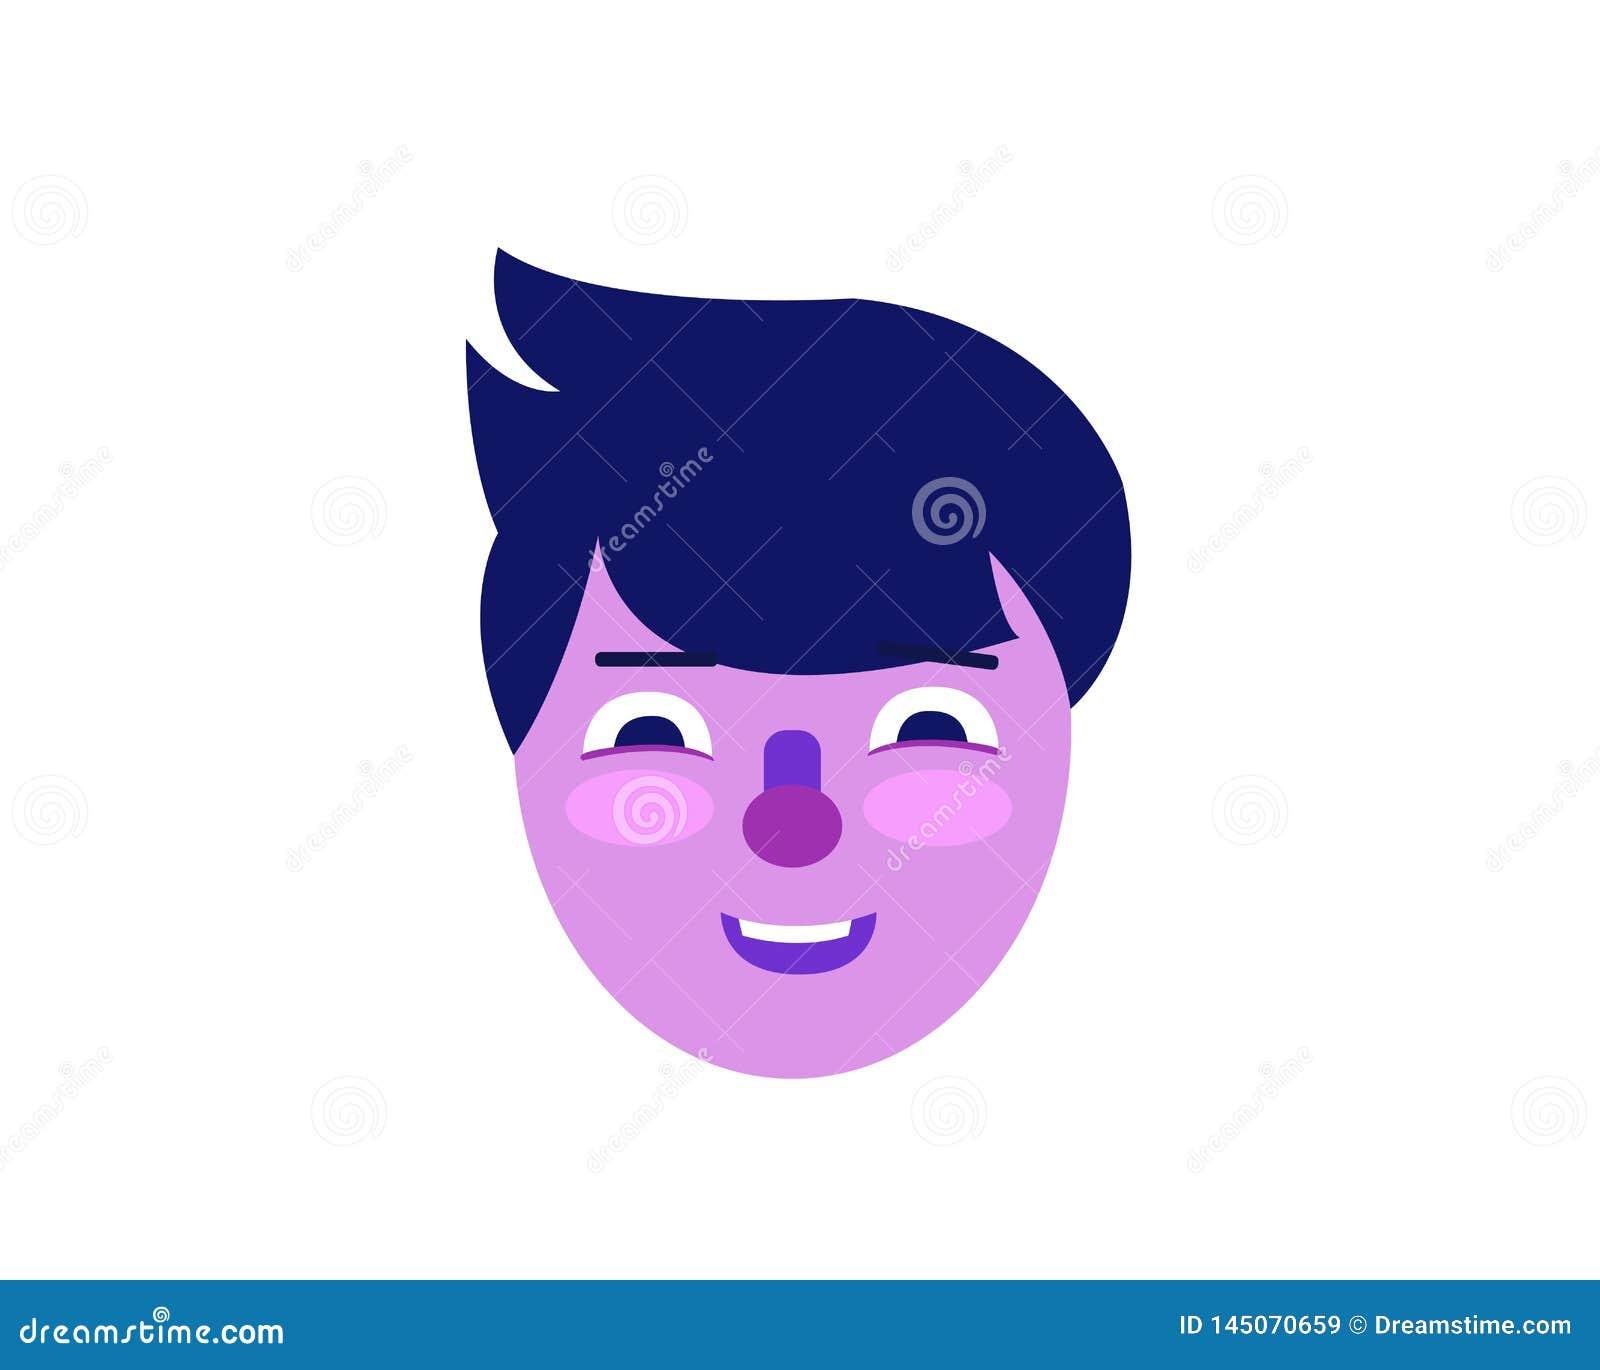 Purple man face illustration in flat style